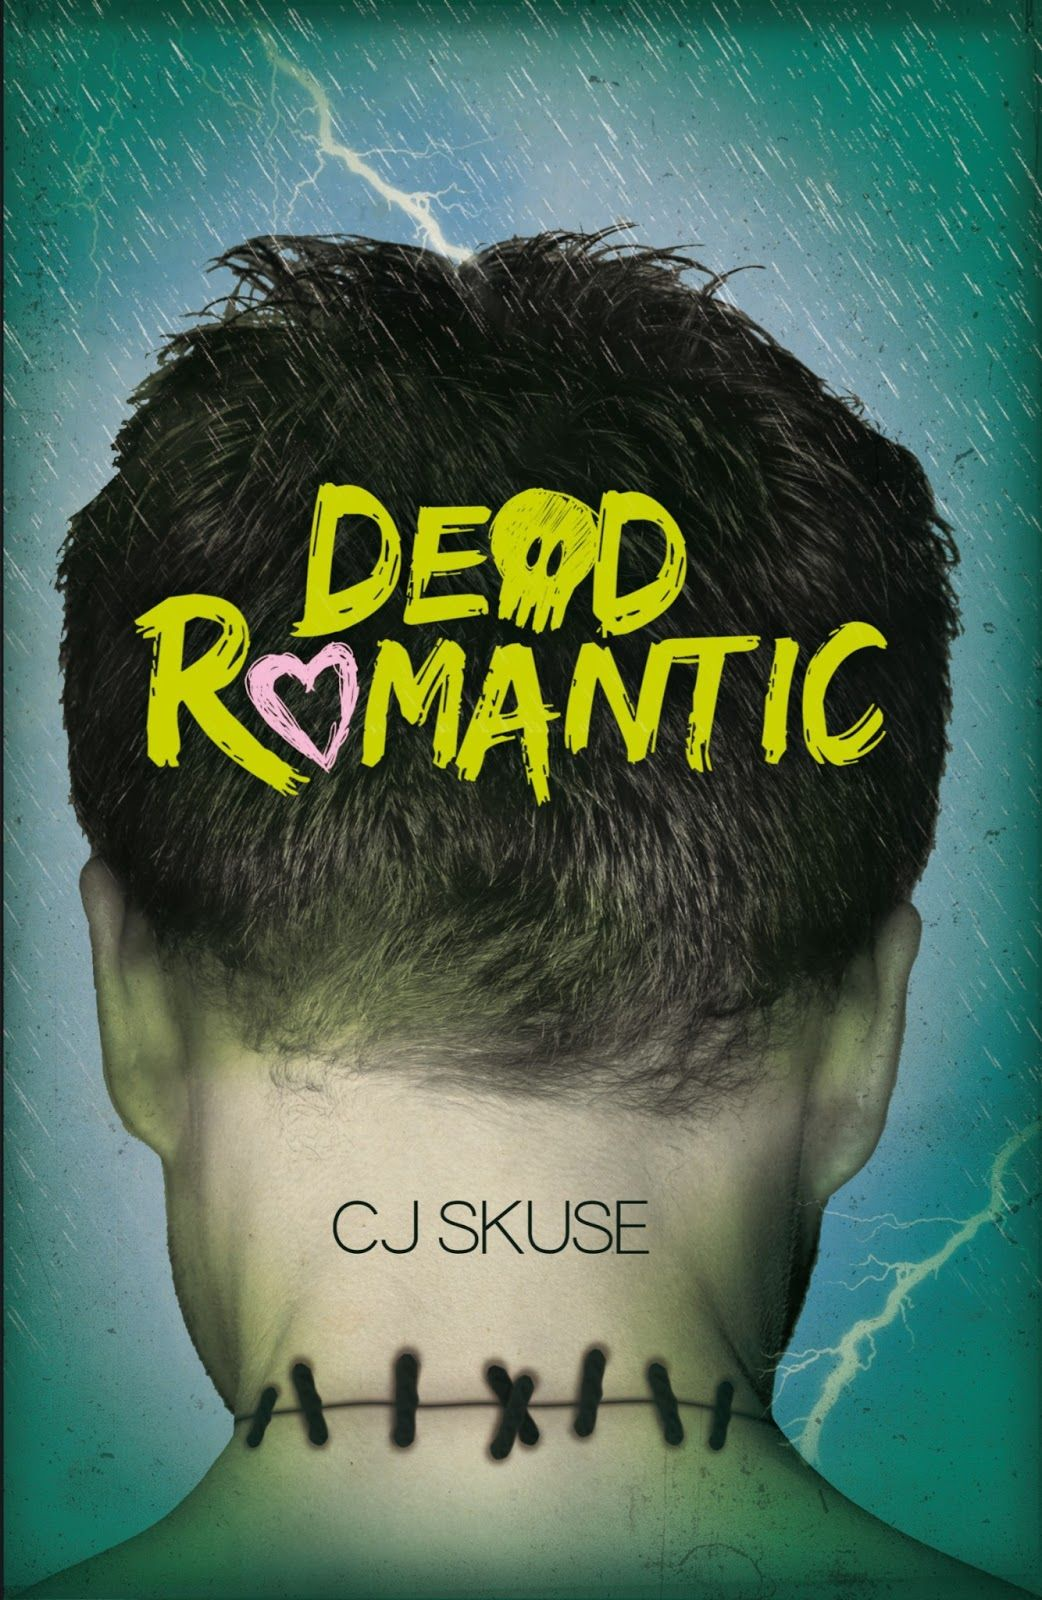 Read my review of Dead Romantic, by CJ Skuse - via authorbethreekles on Tumblr